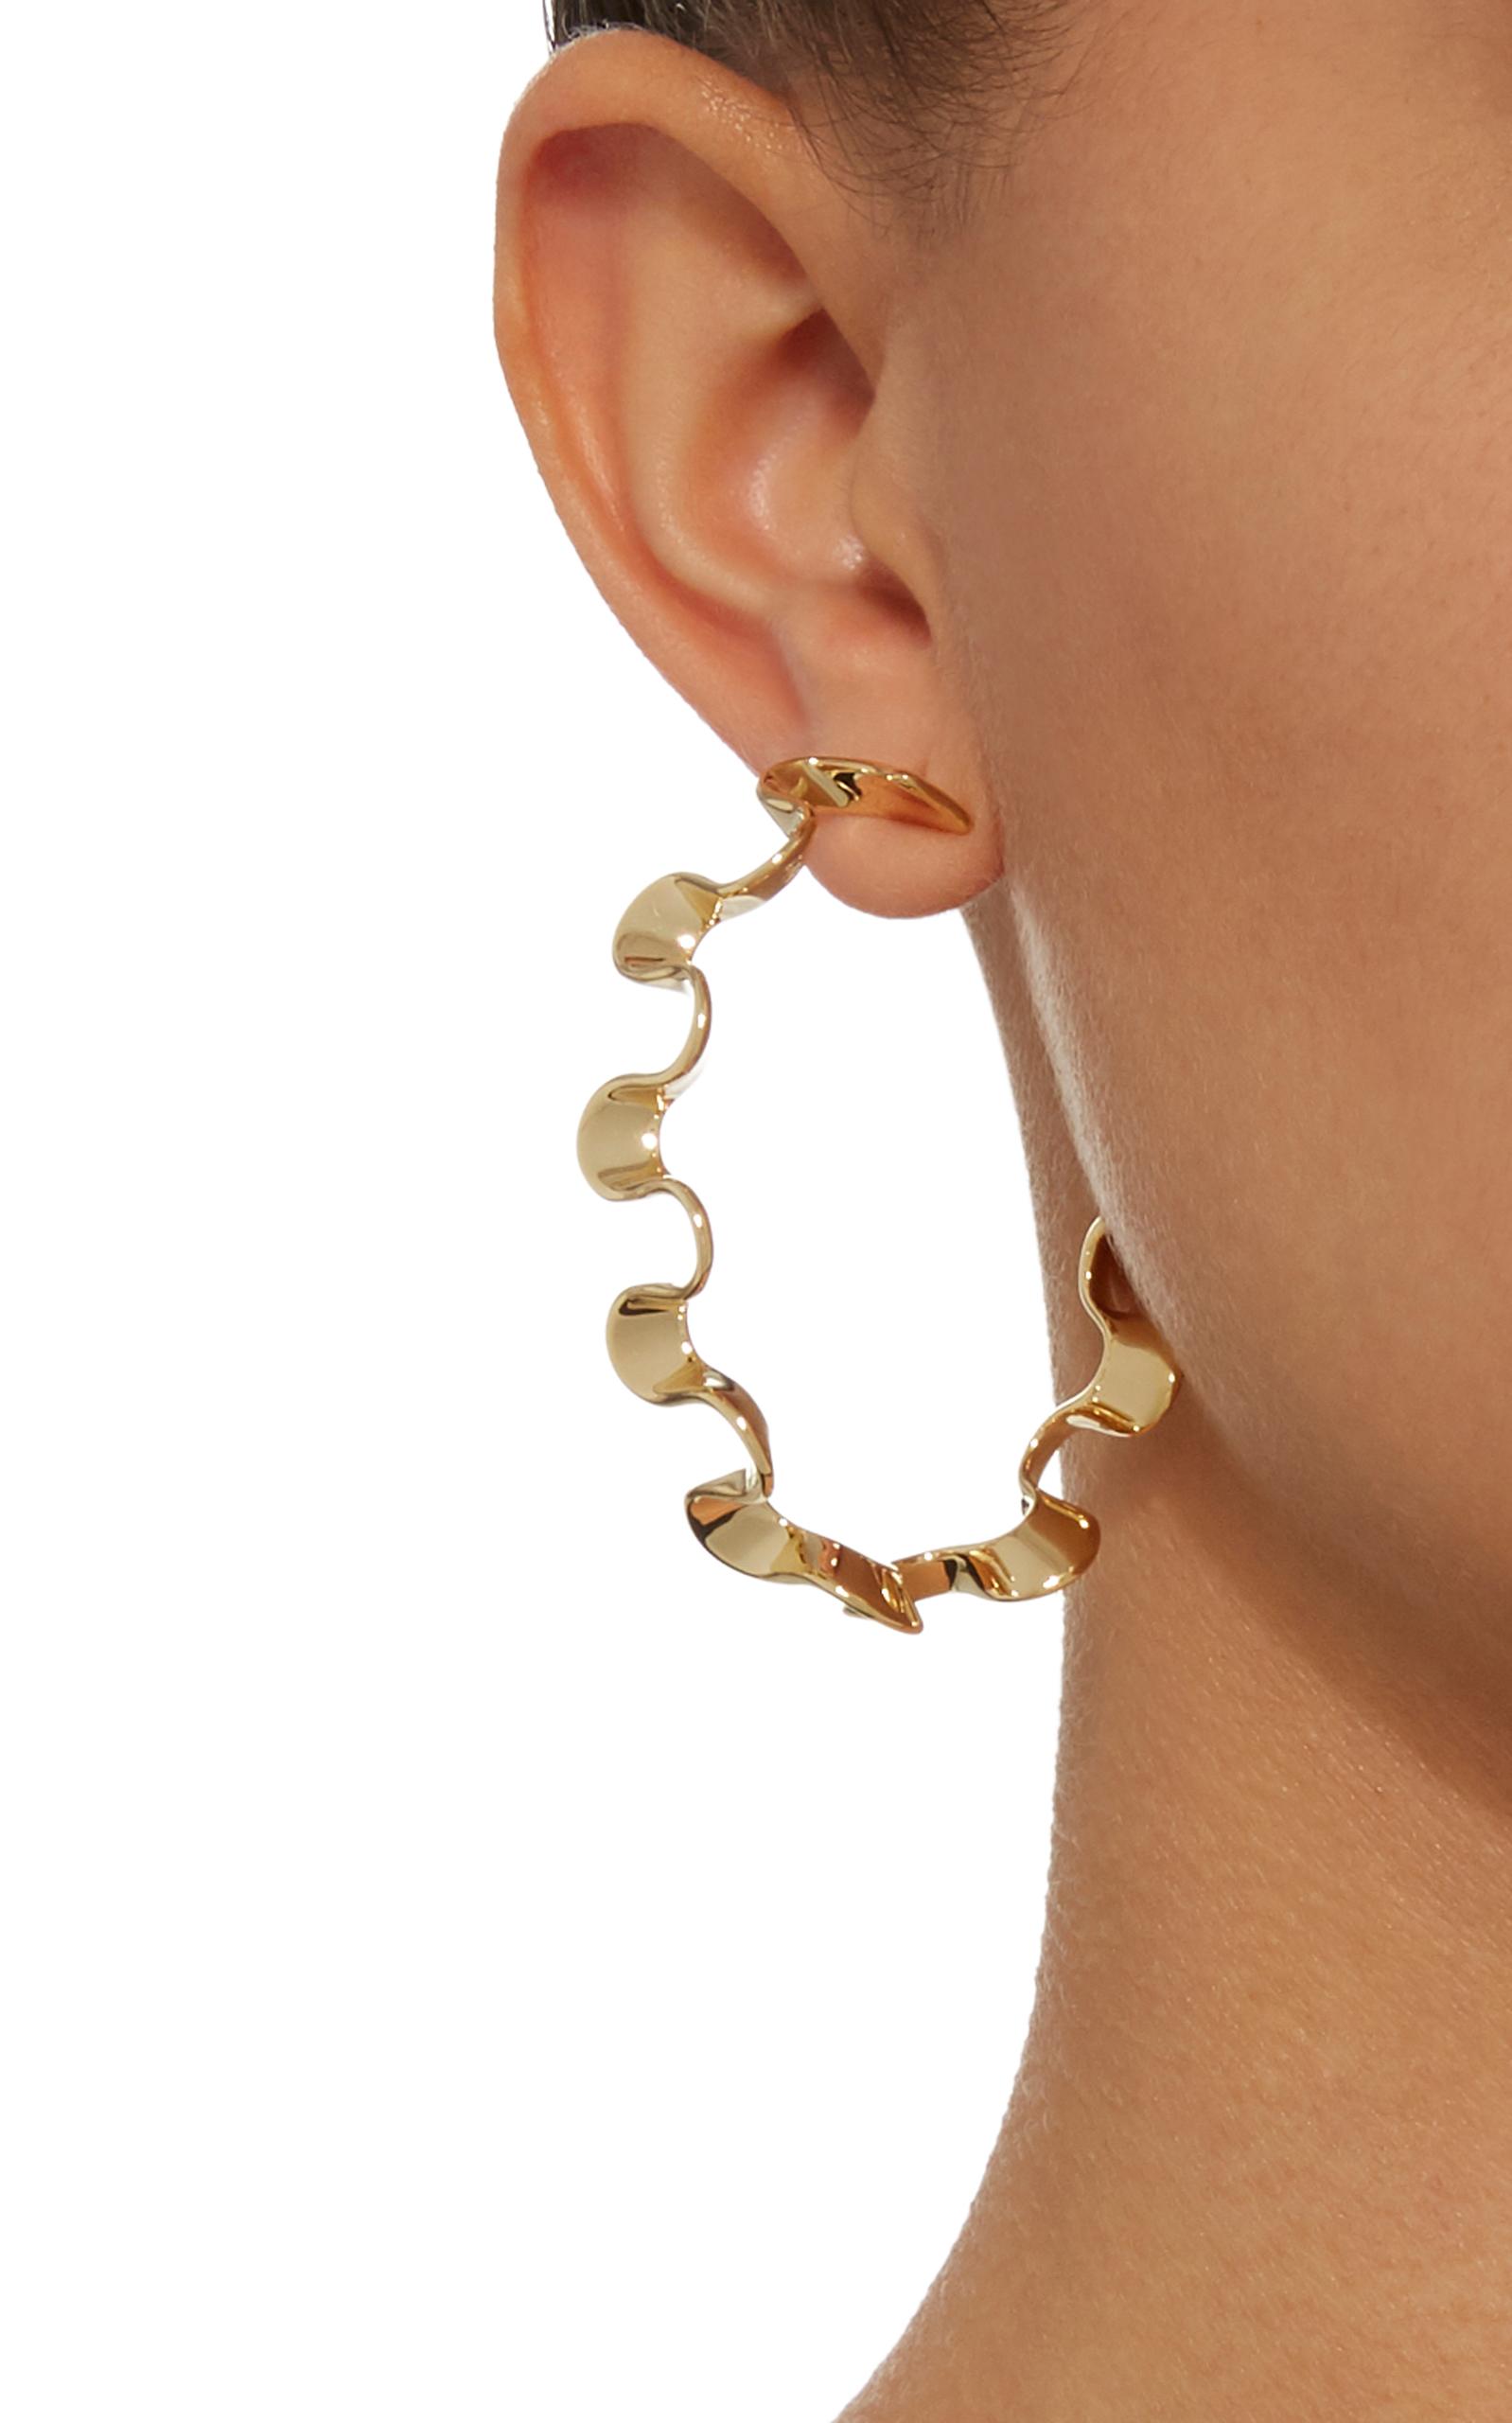 Sarah Jessica Parker Designs Fine Jewelry picture